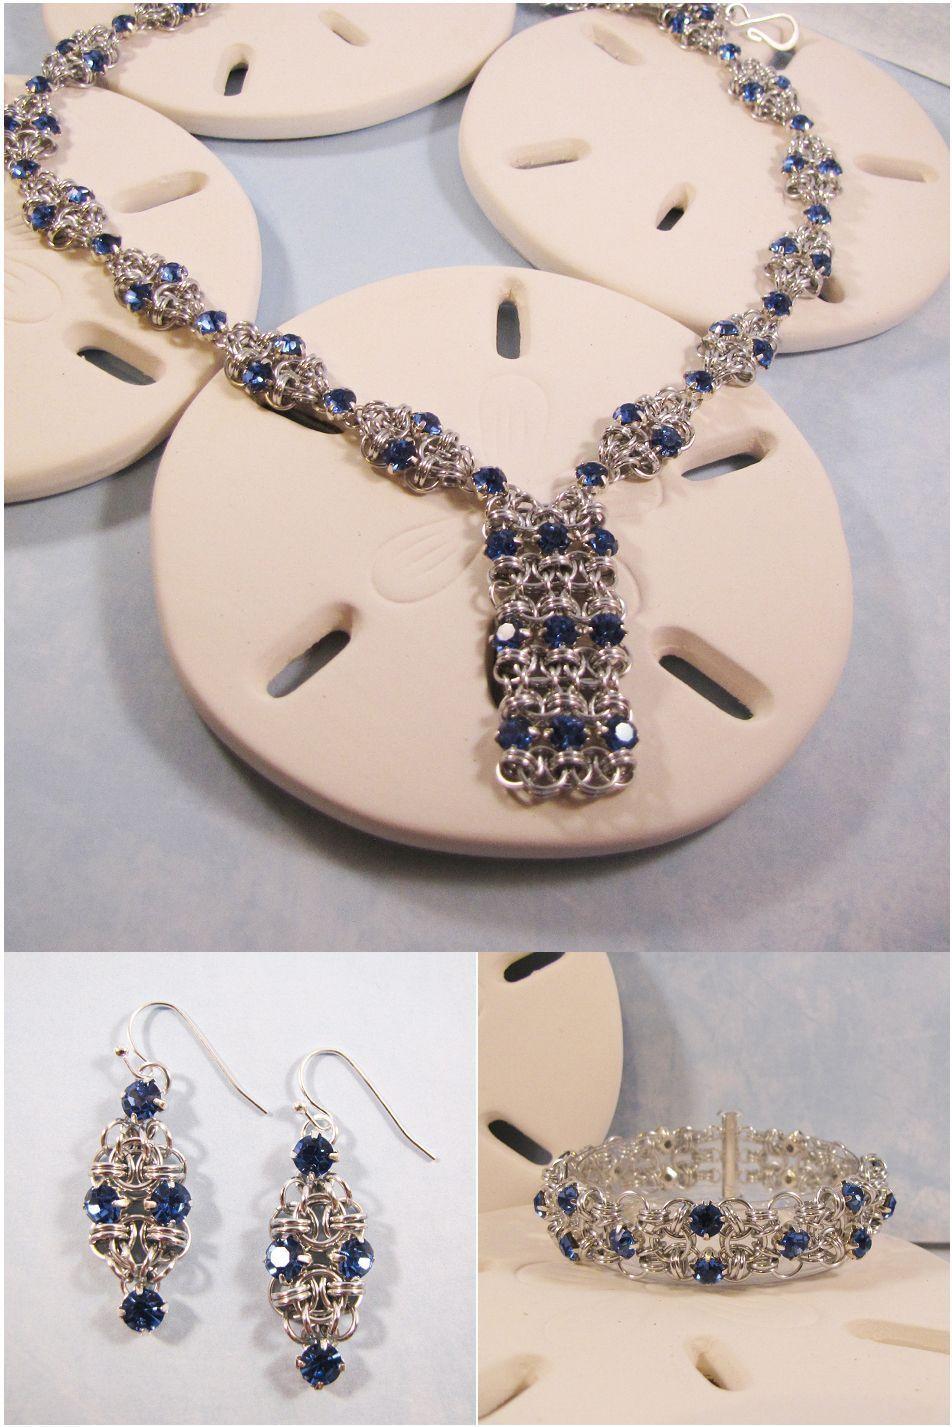 Geometric helm series in silver u light sapphire necklace bracelet